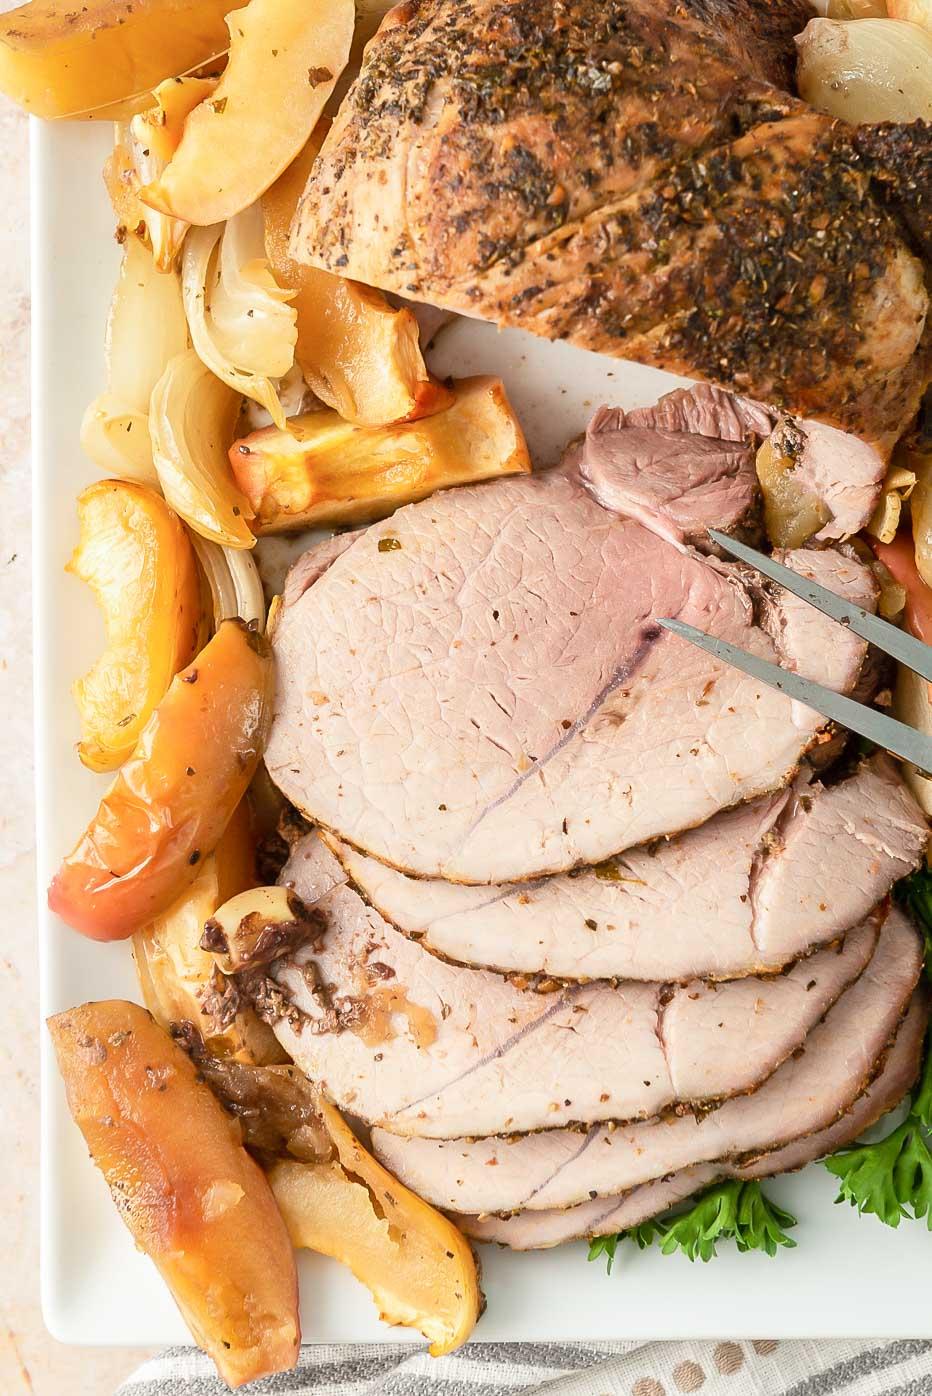 Boneless pork roast with apples and onions